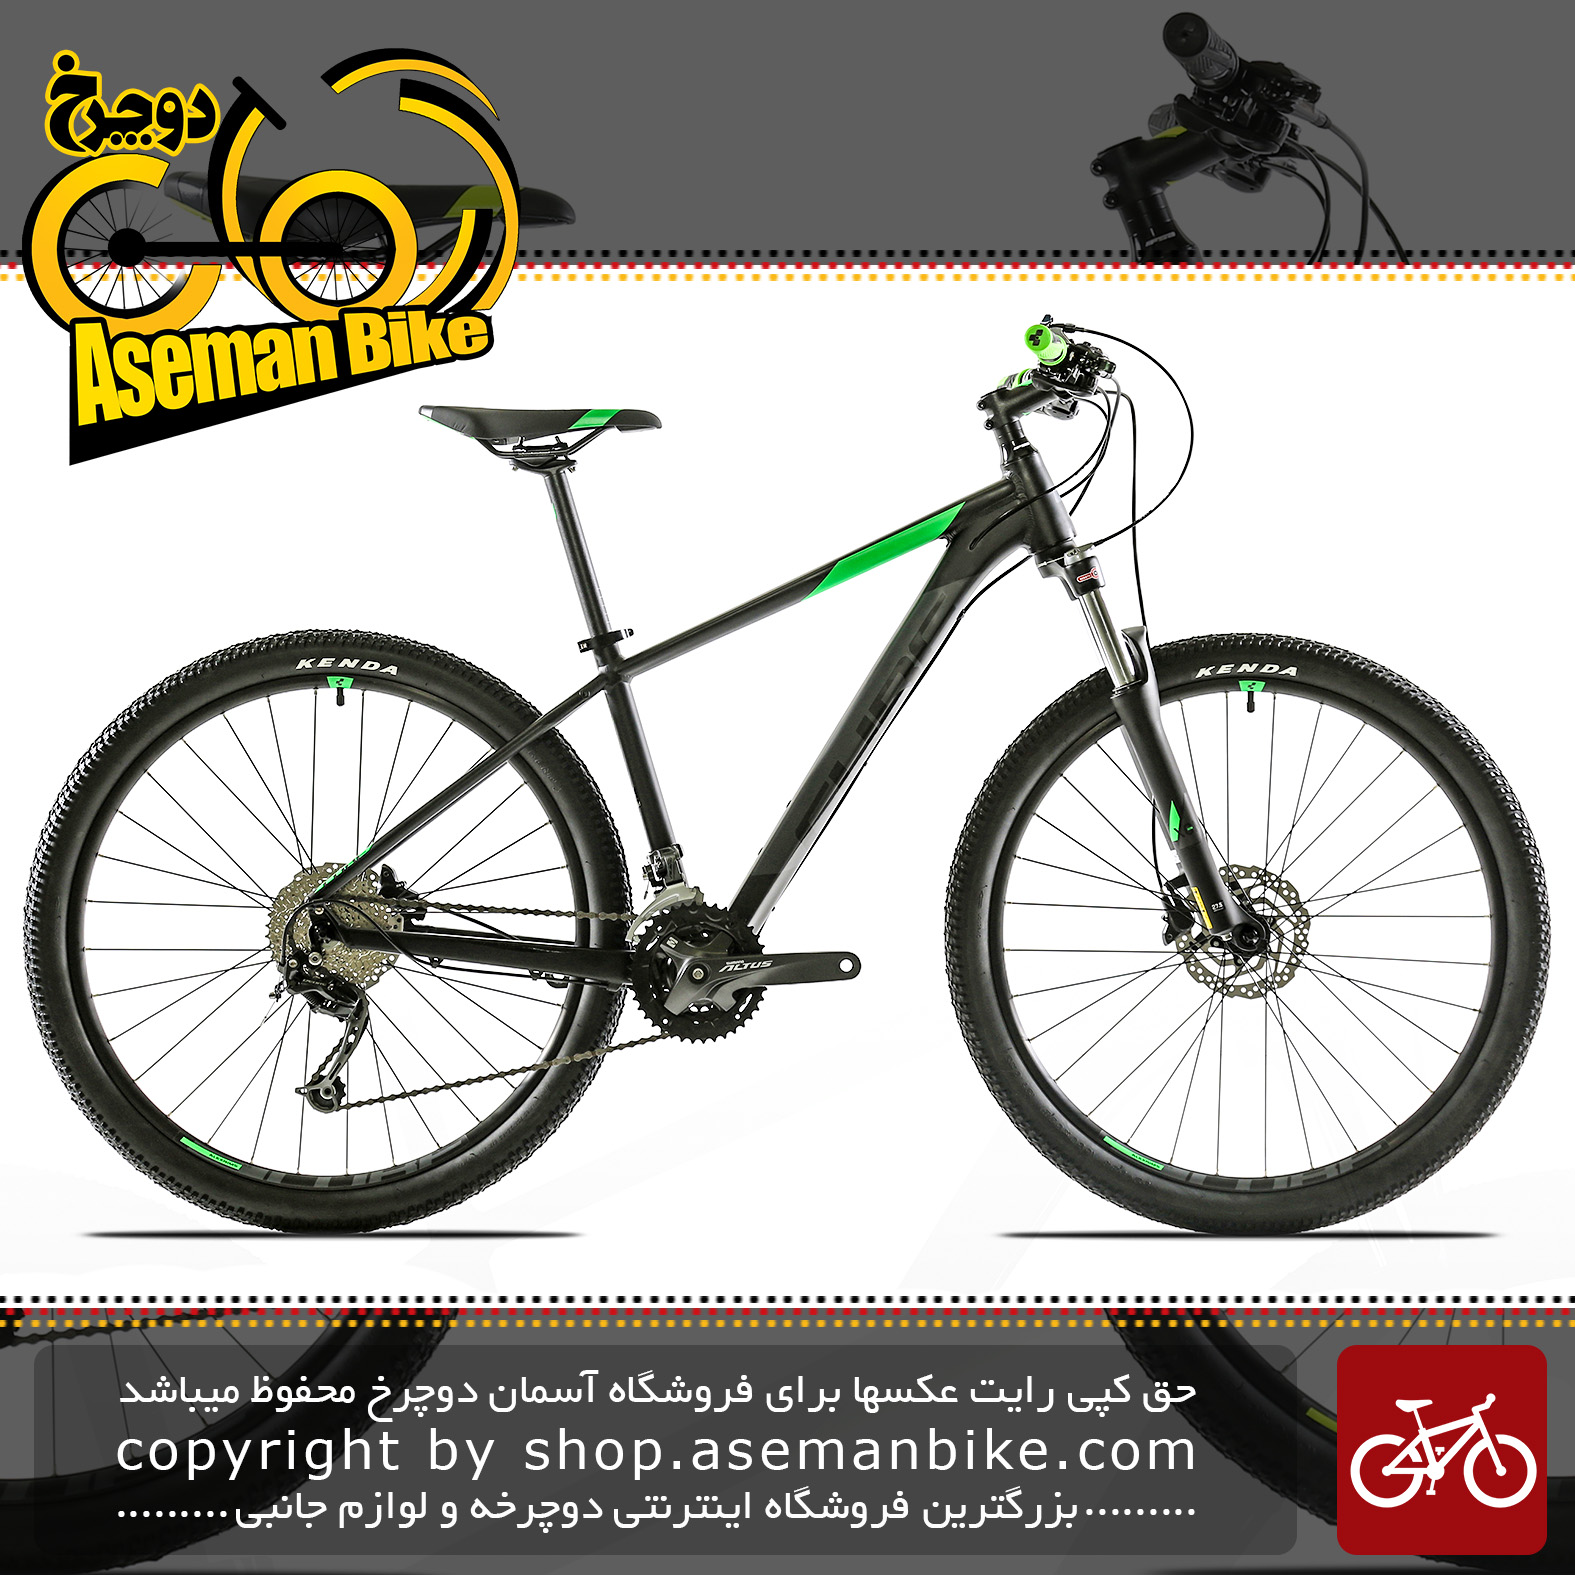 دوچرخه کوهستان کیوب مدل آیم اس ال سایز ۲۷٫۵ سبز آبی CUBE Mountain Bike AIM SL 2017